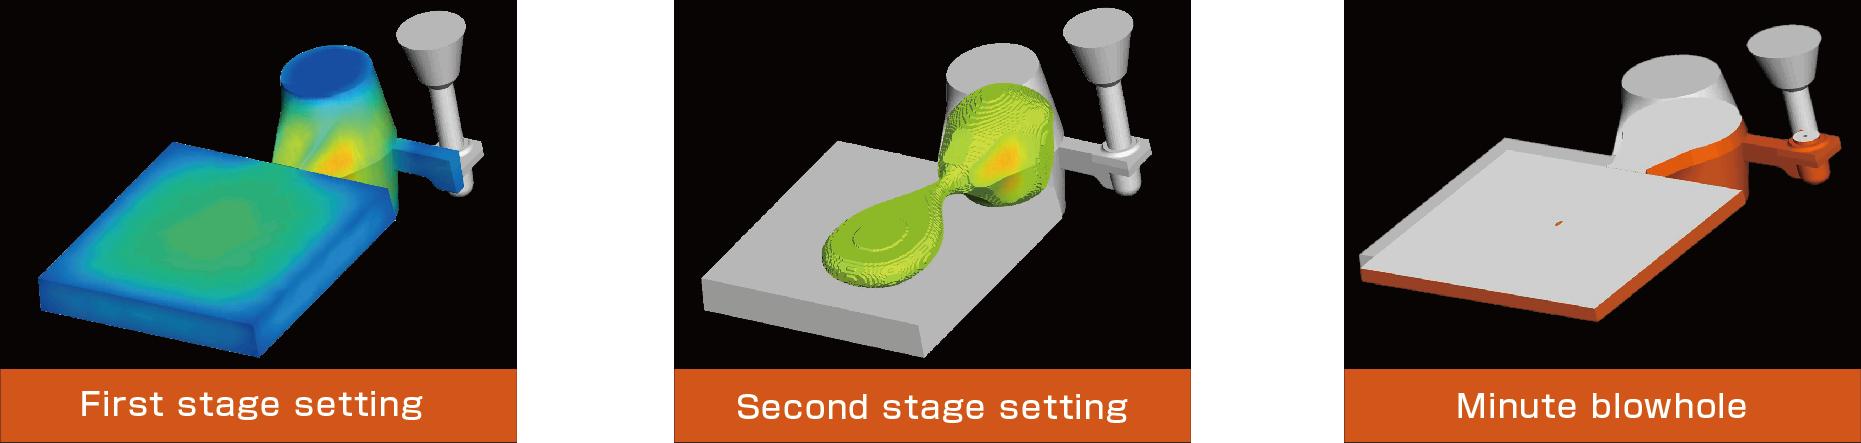 Setting simulation